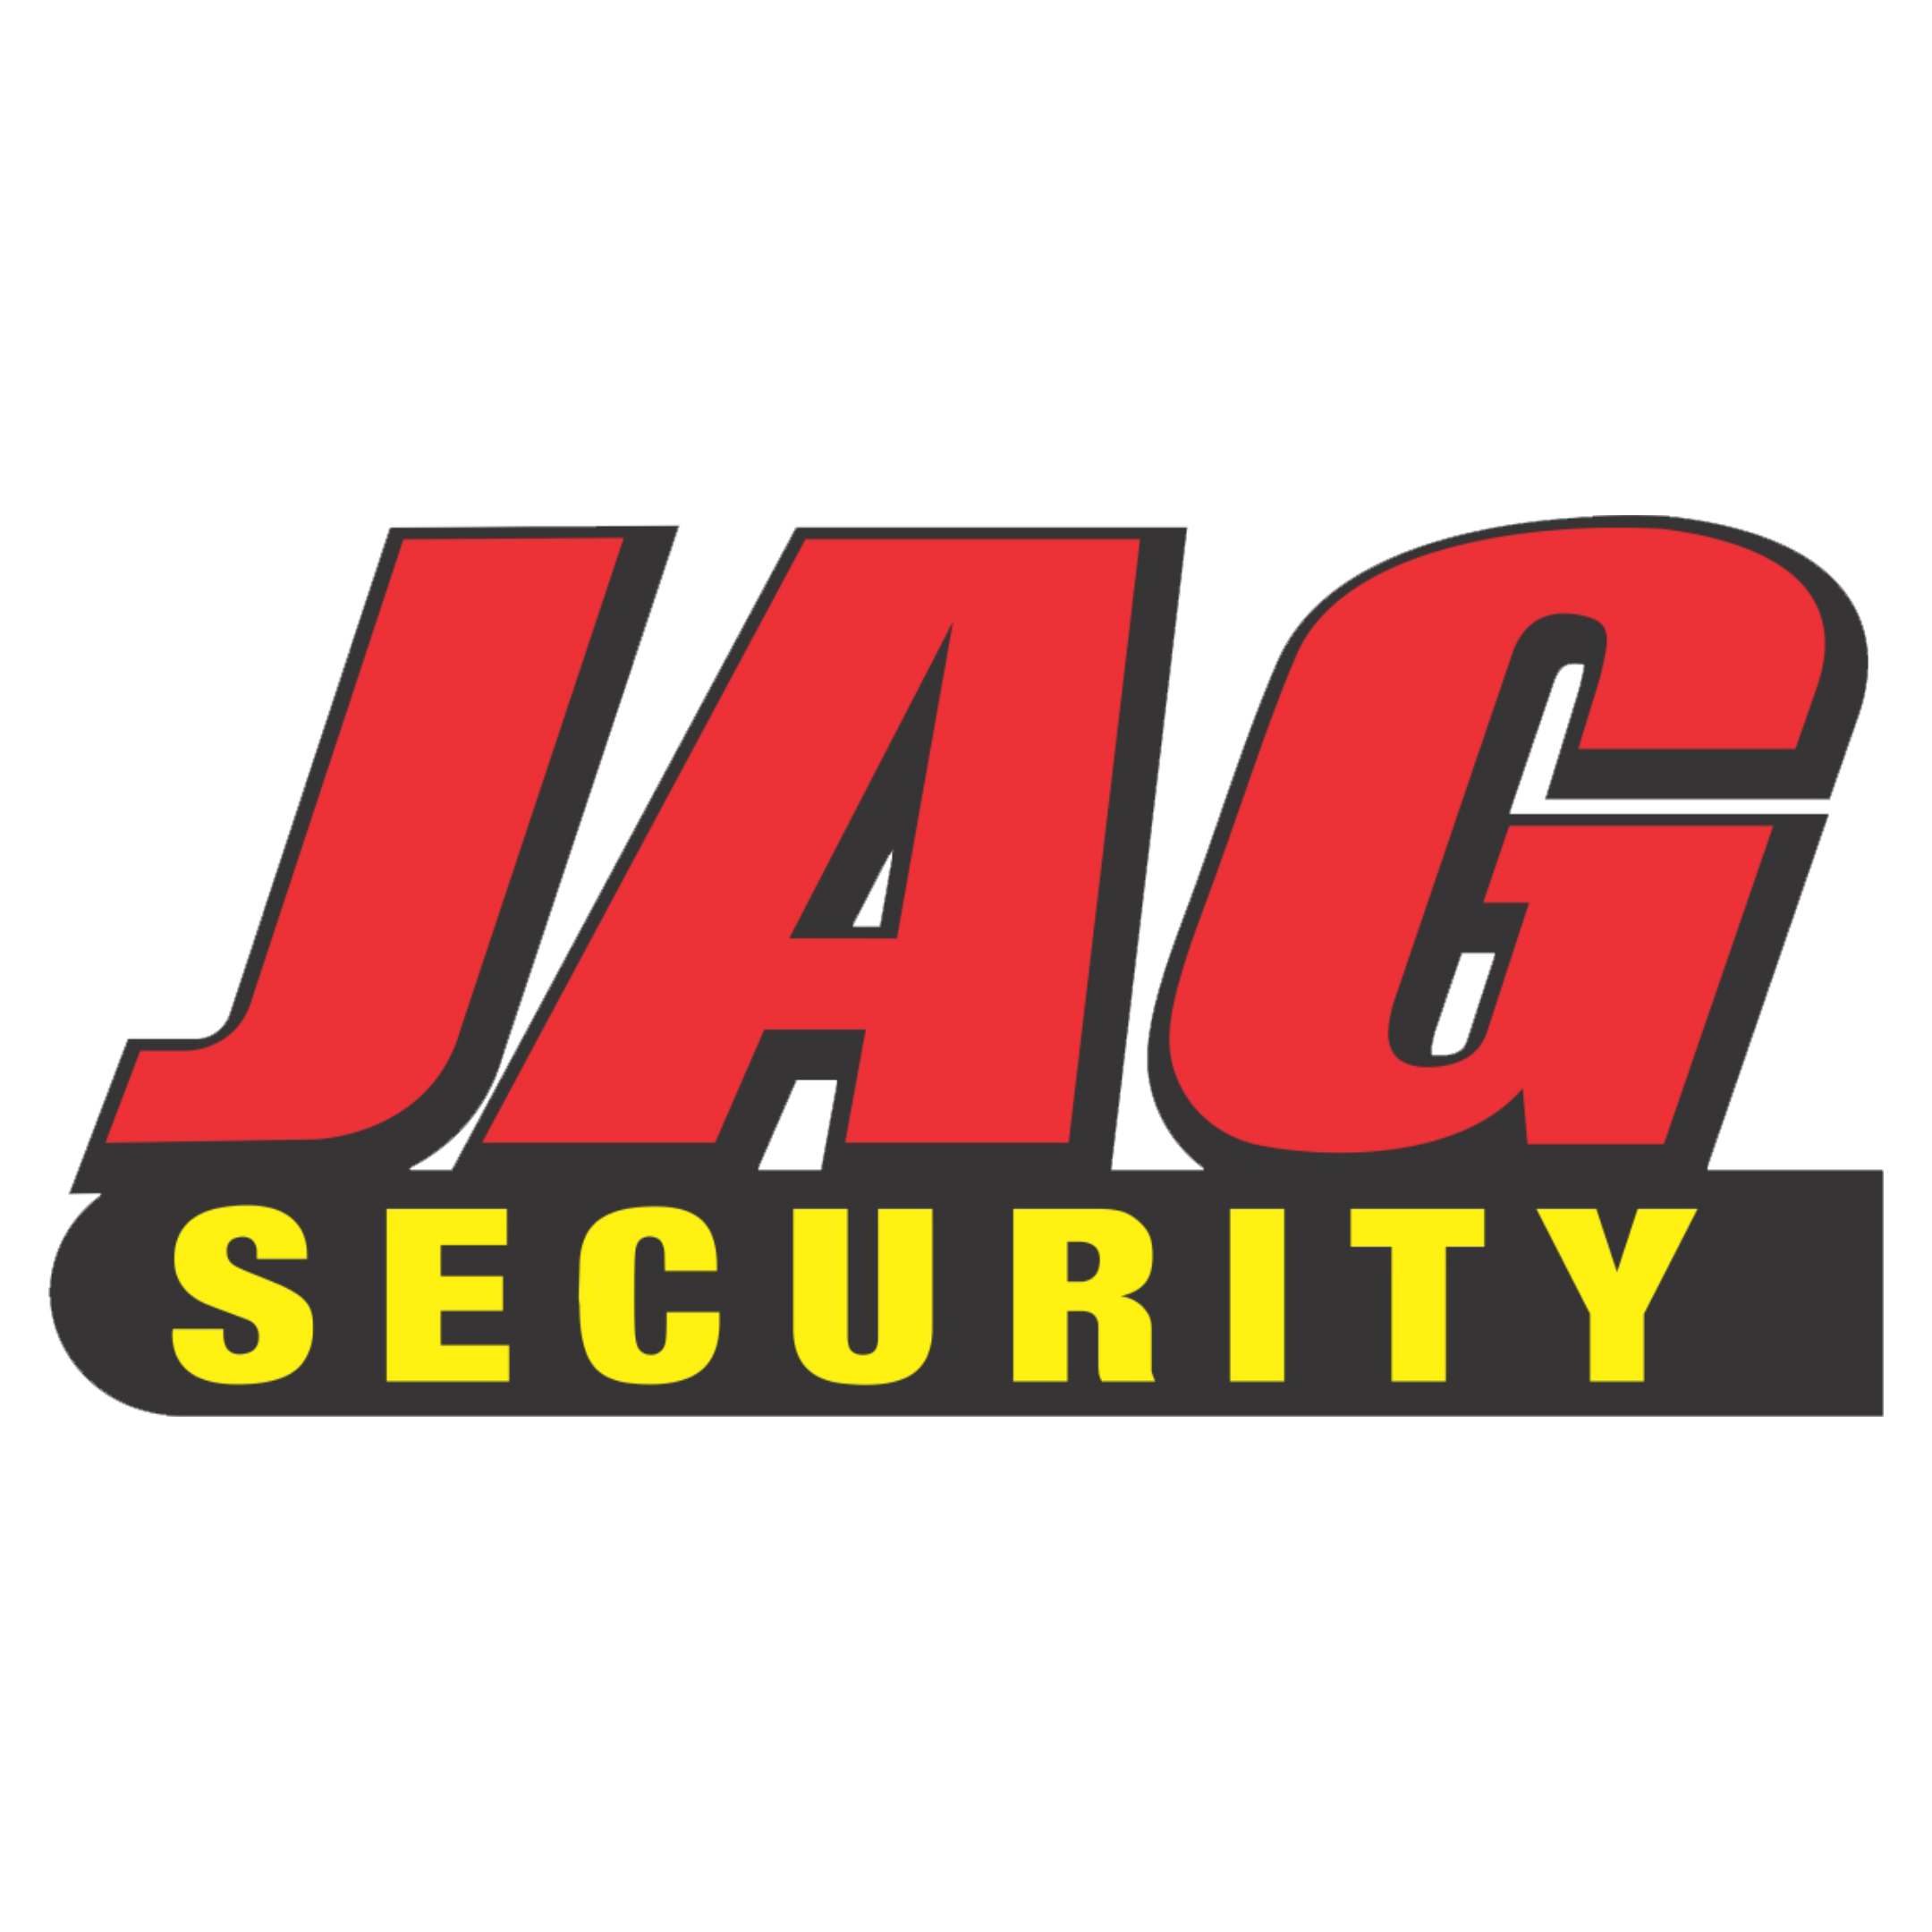 Jag Security